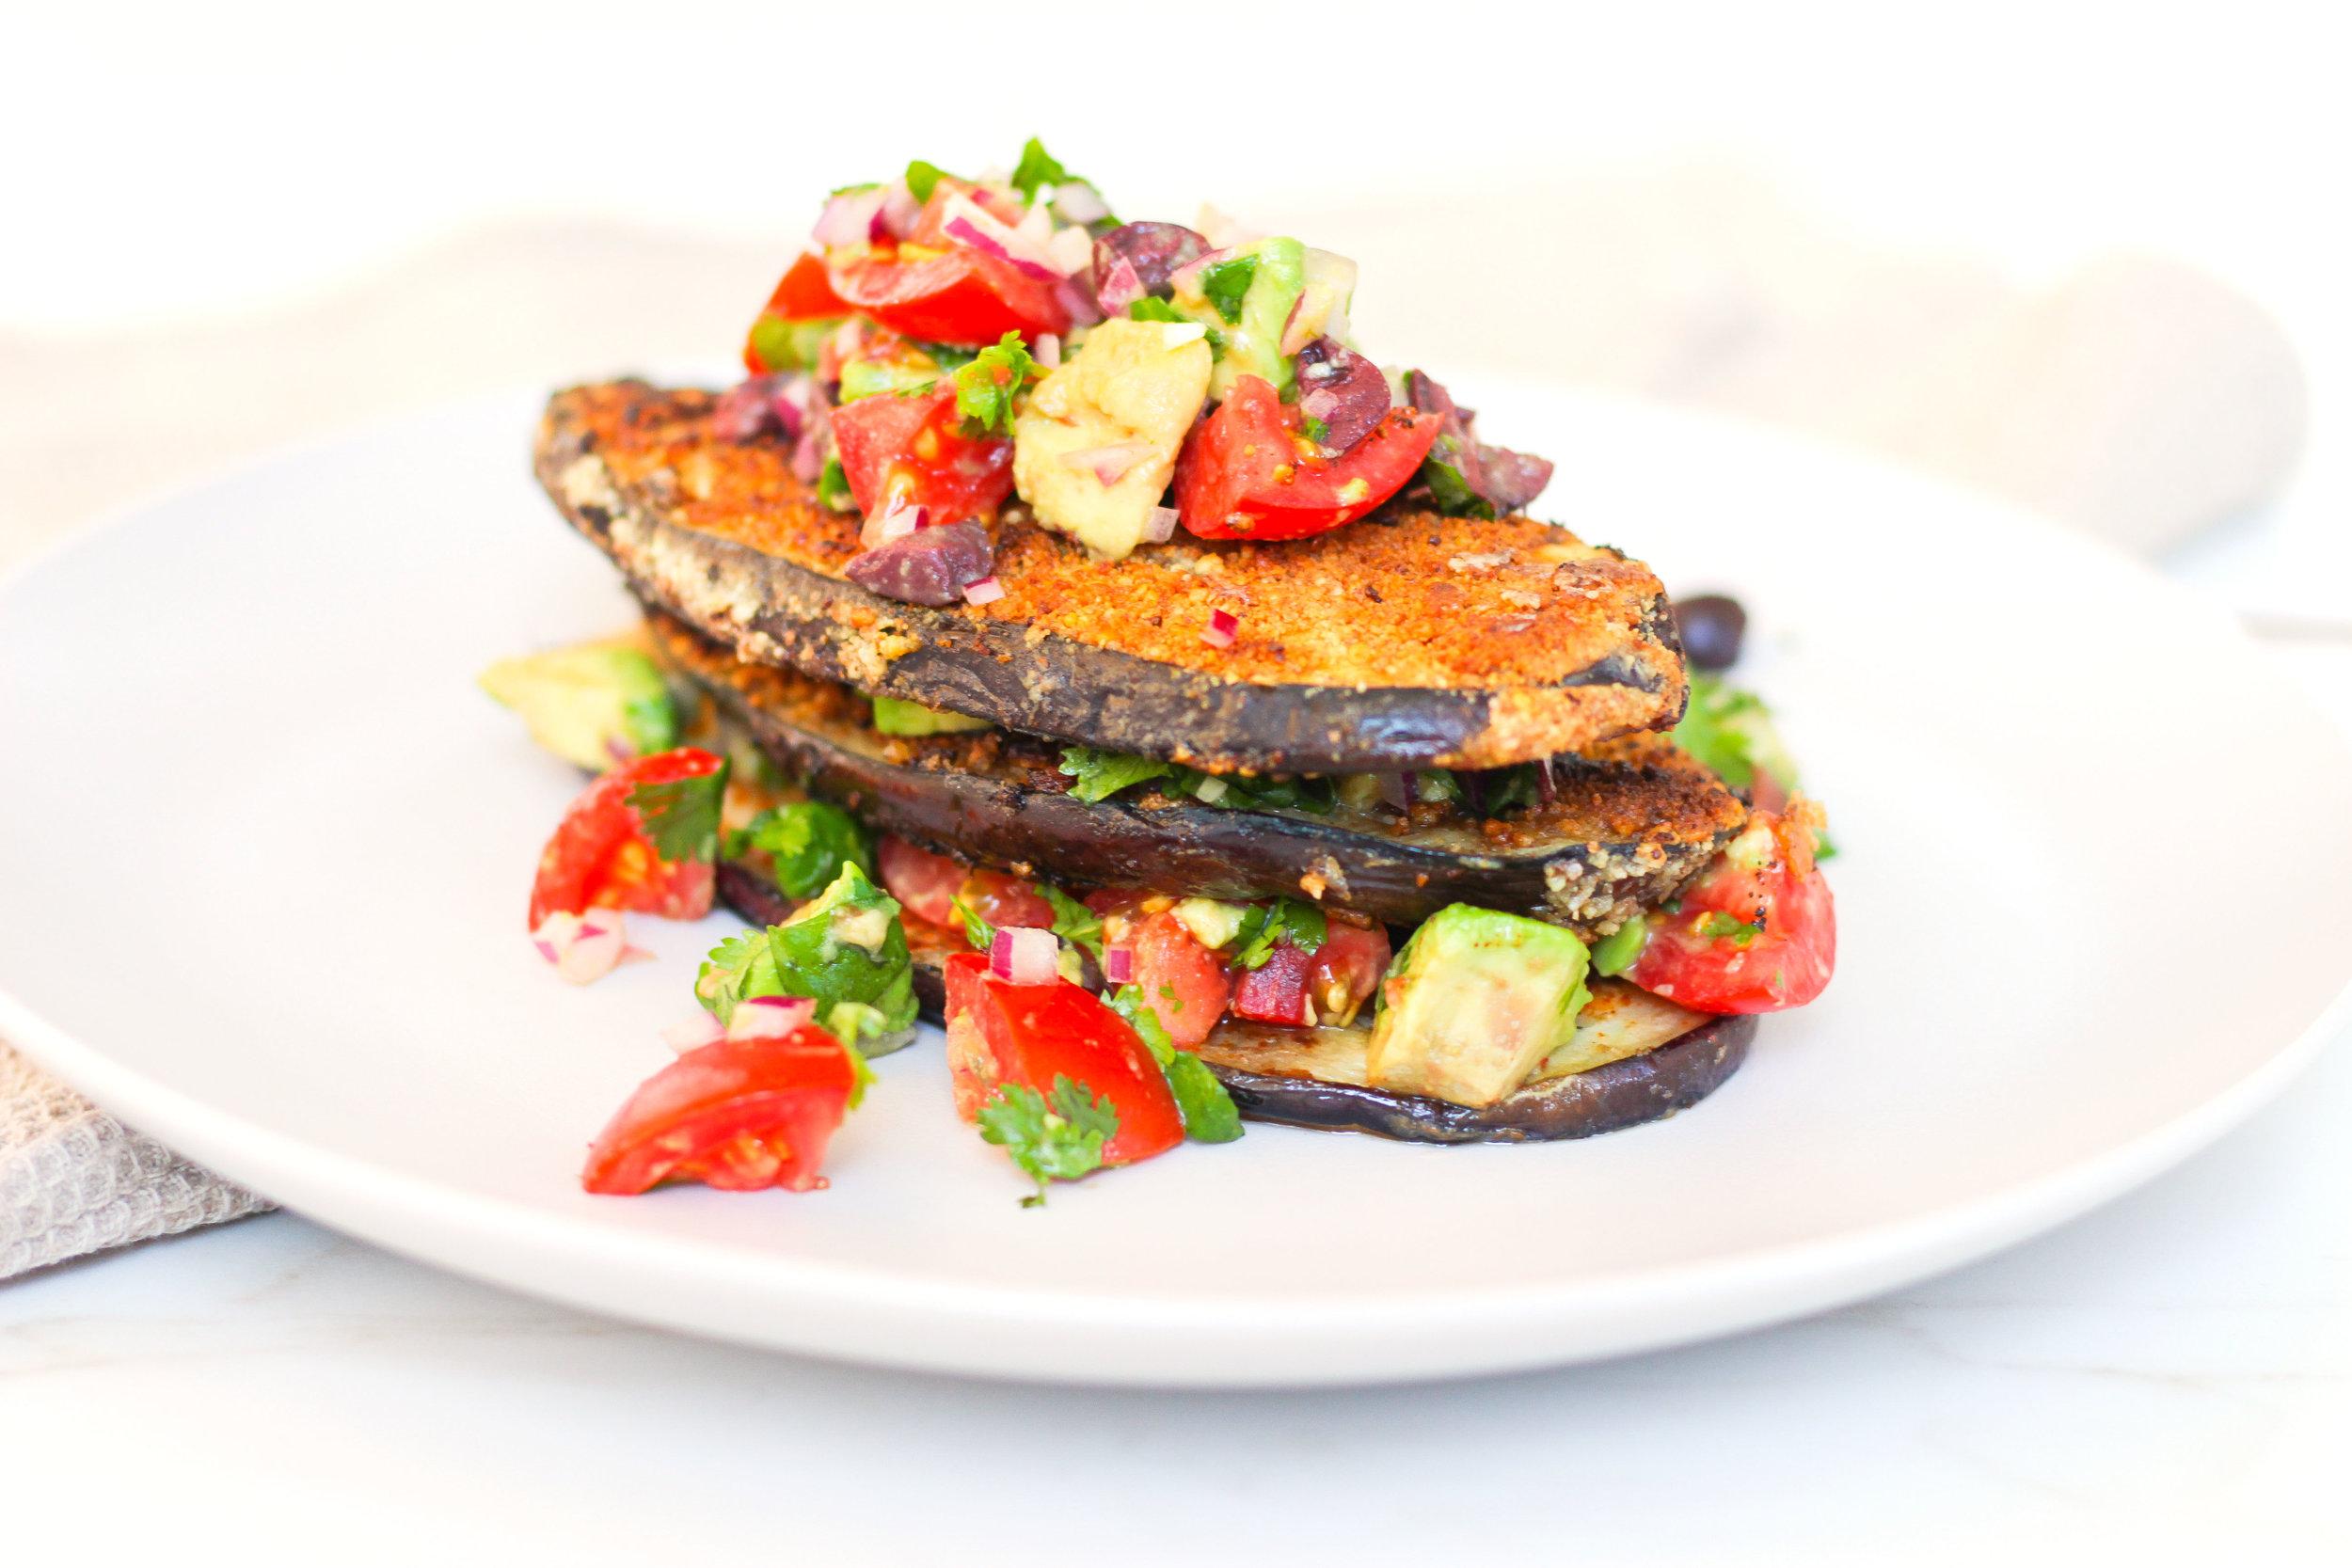 Crispy Eggplant with Avocado & Tomato Salsa